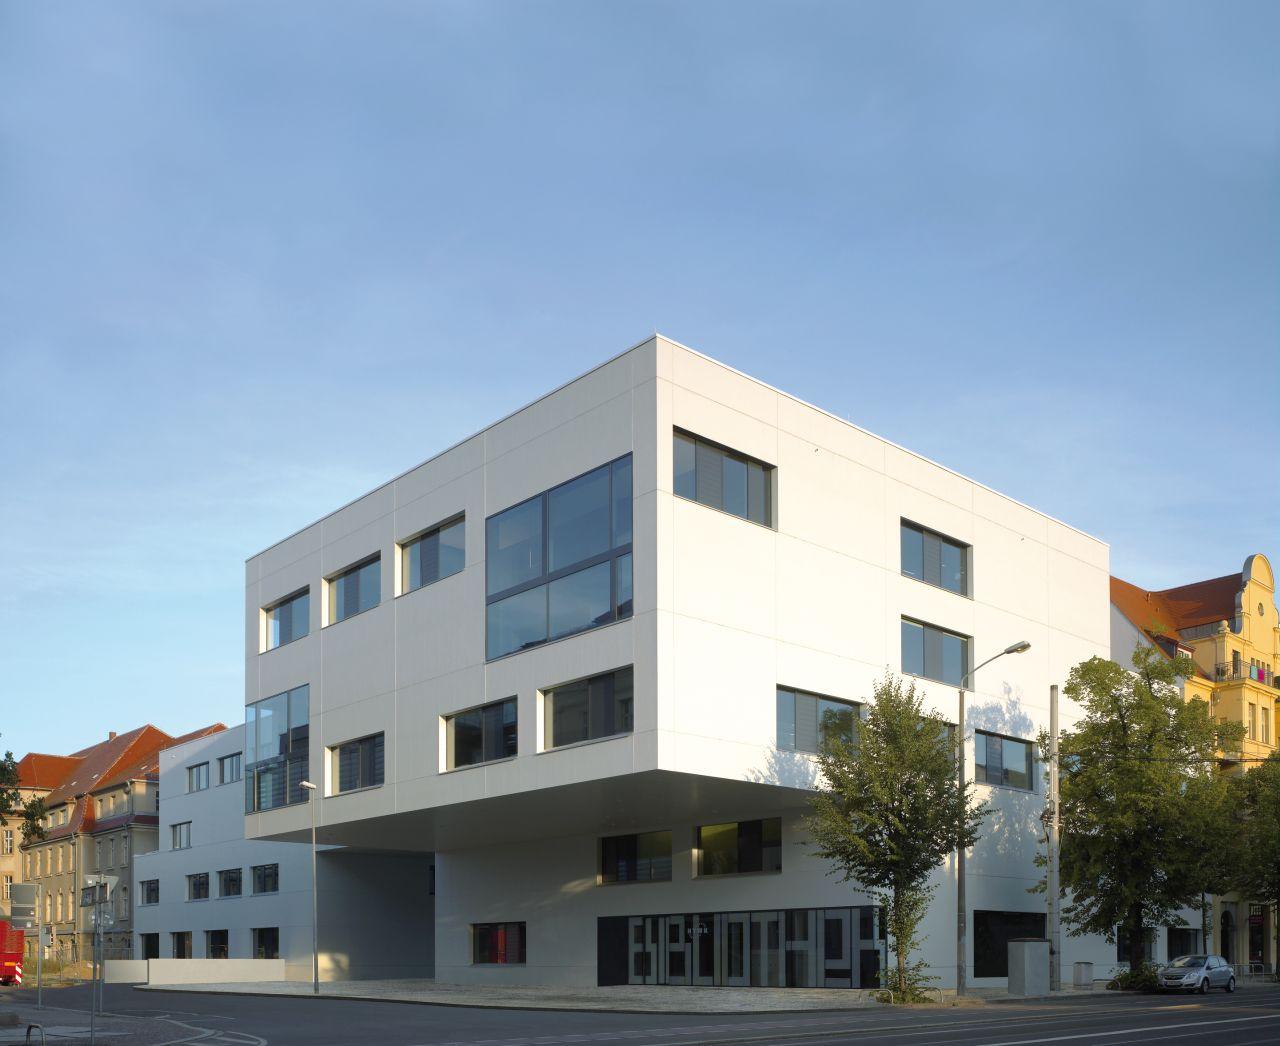 Library and media centre / Léon Wohlhage Wernik Architekten, © Christian Richters